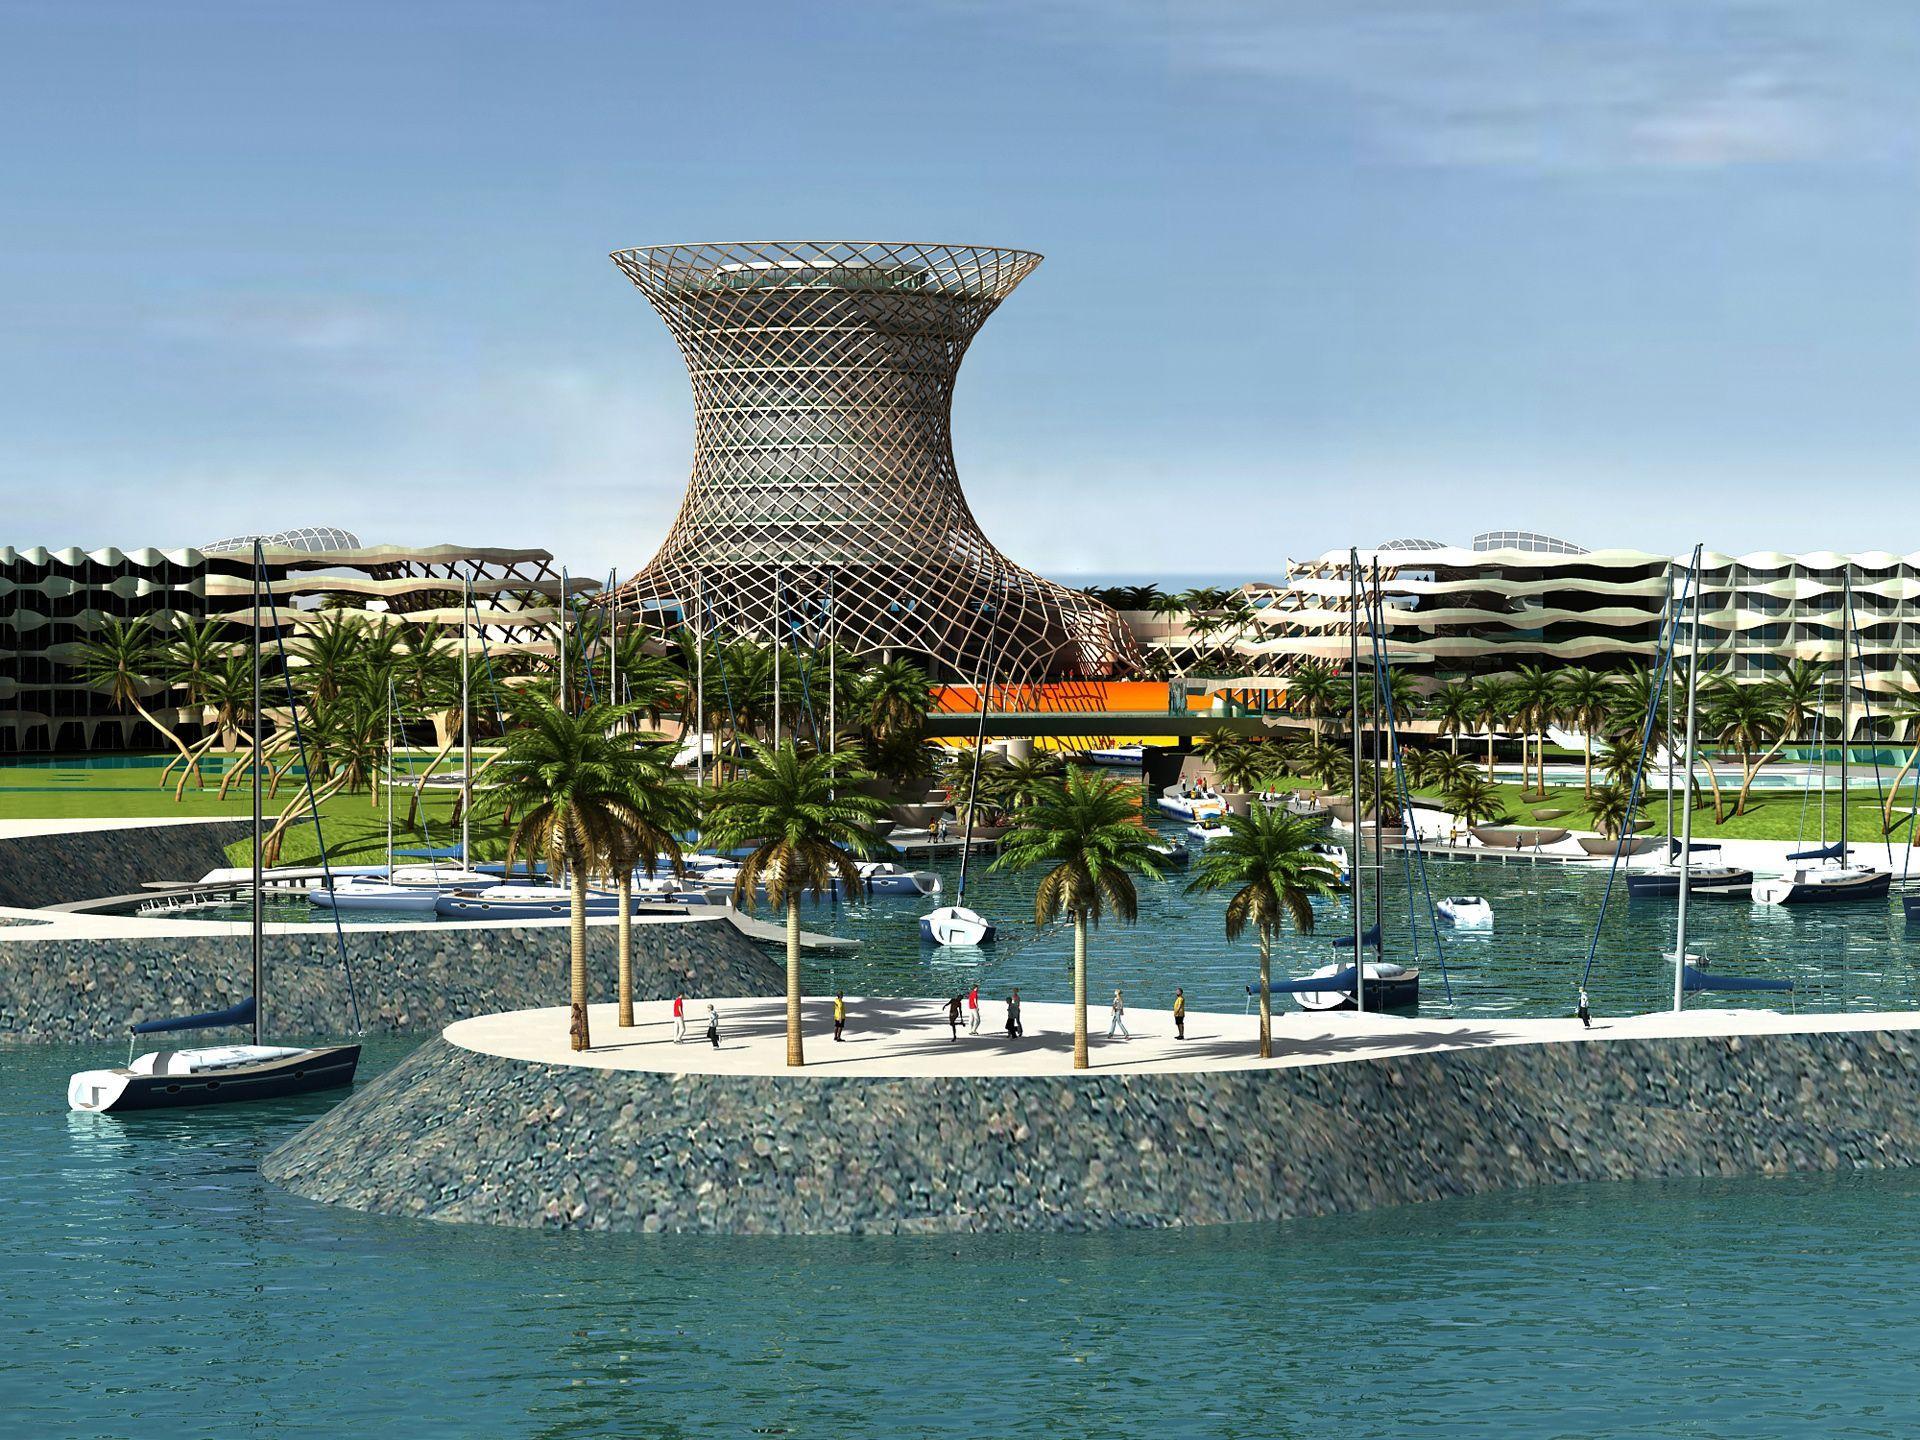 Octopus Hotel #Hotel #Architecture #Asia #Building #China #Design # Futuristic